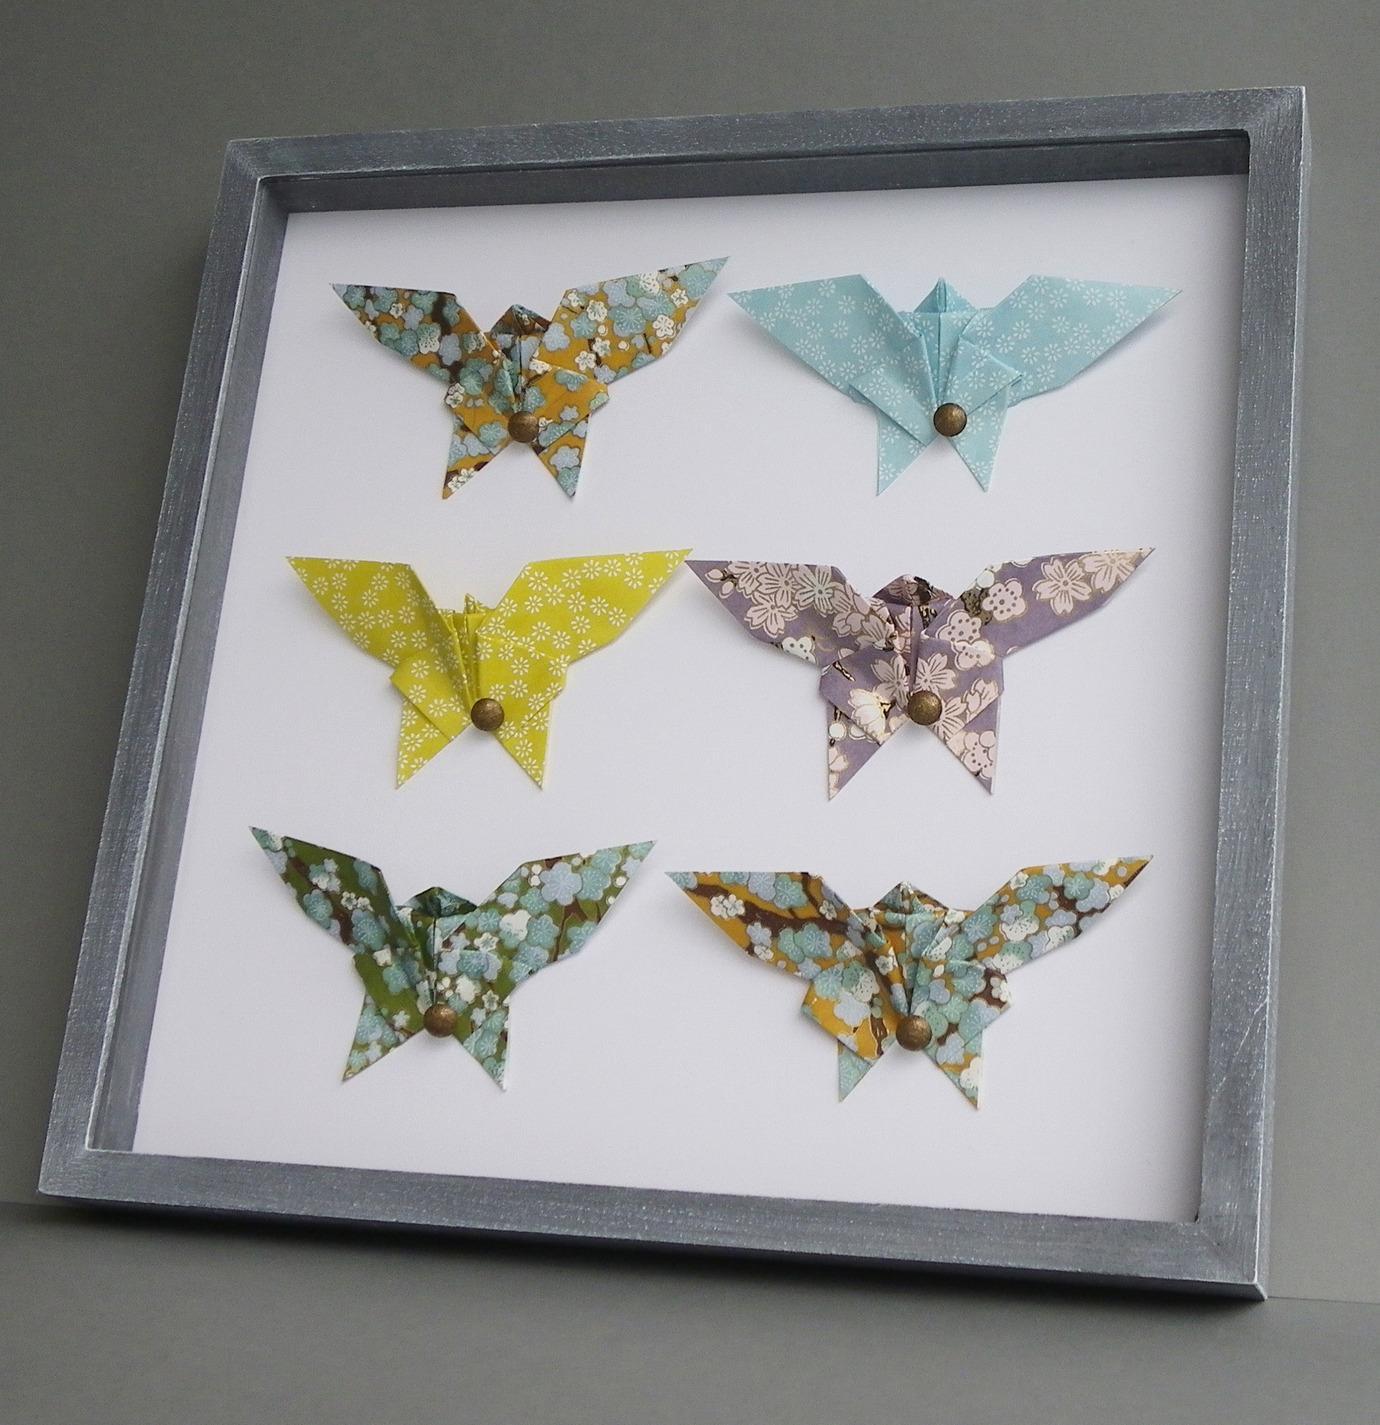 Панно с бабочками